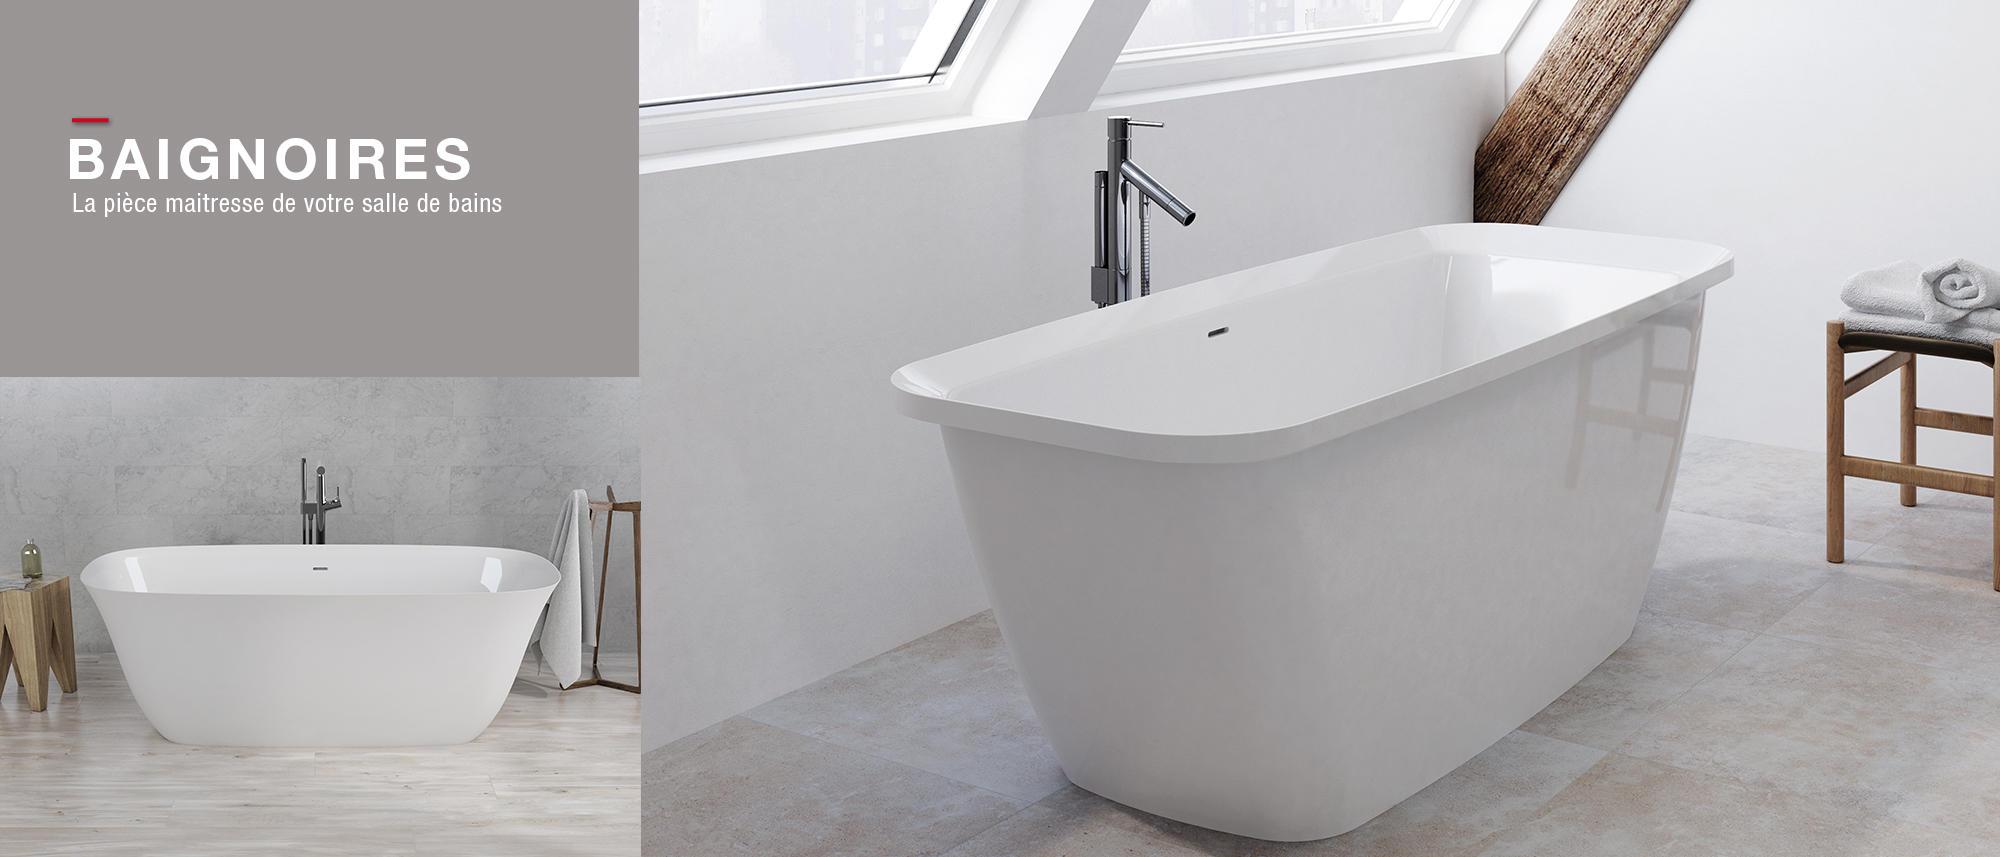 Meubles de salle de bains, baignoires, fabricant français CEDAM